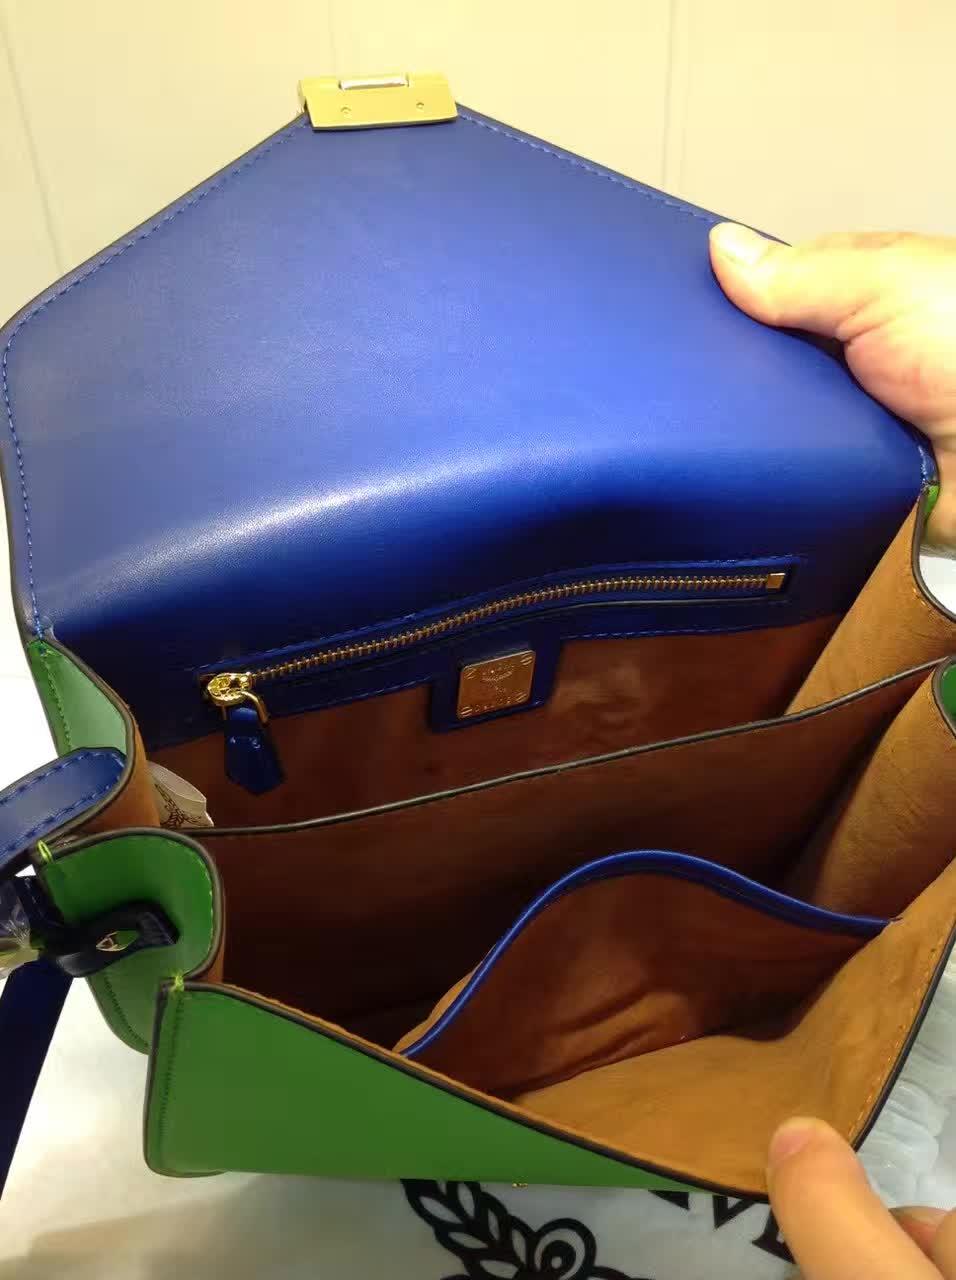 MCM官网 Patricia系列邮差包 外观简约时尚 翻绒内里 实用多隔层 蓝绿